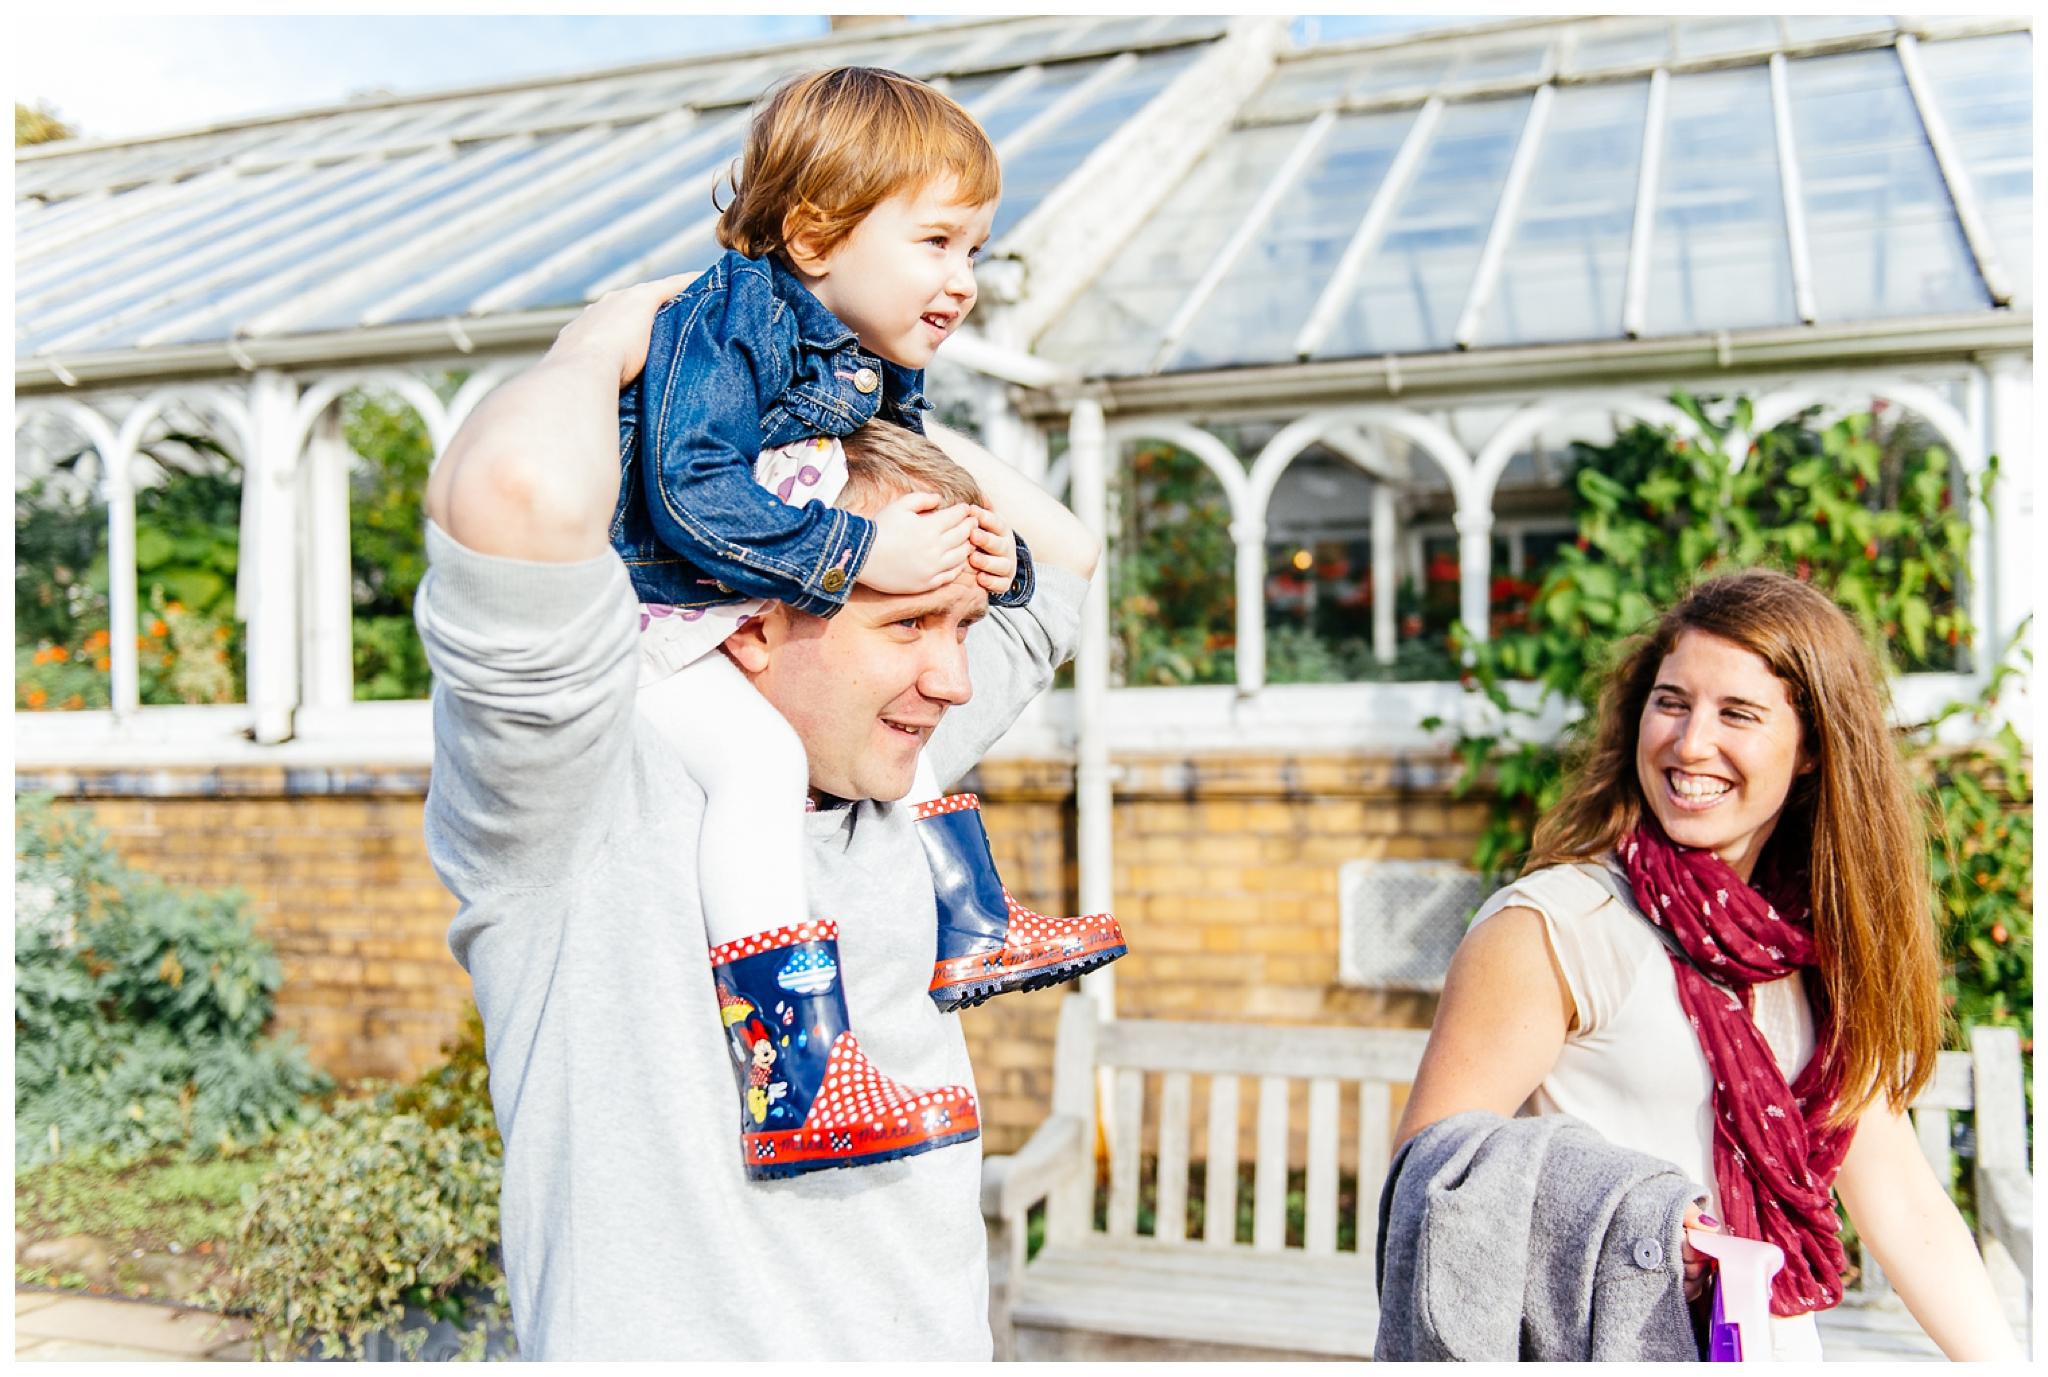 Autumn-family-portraits-birmingham-photographer_0016.jpg